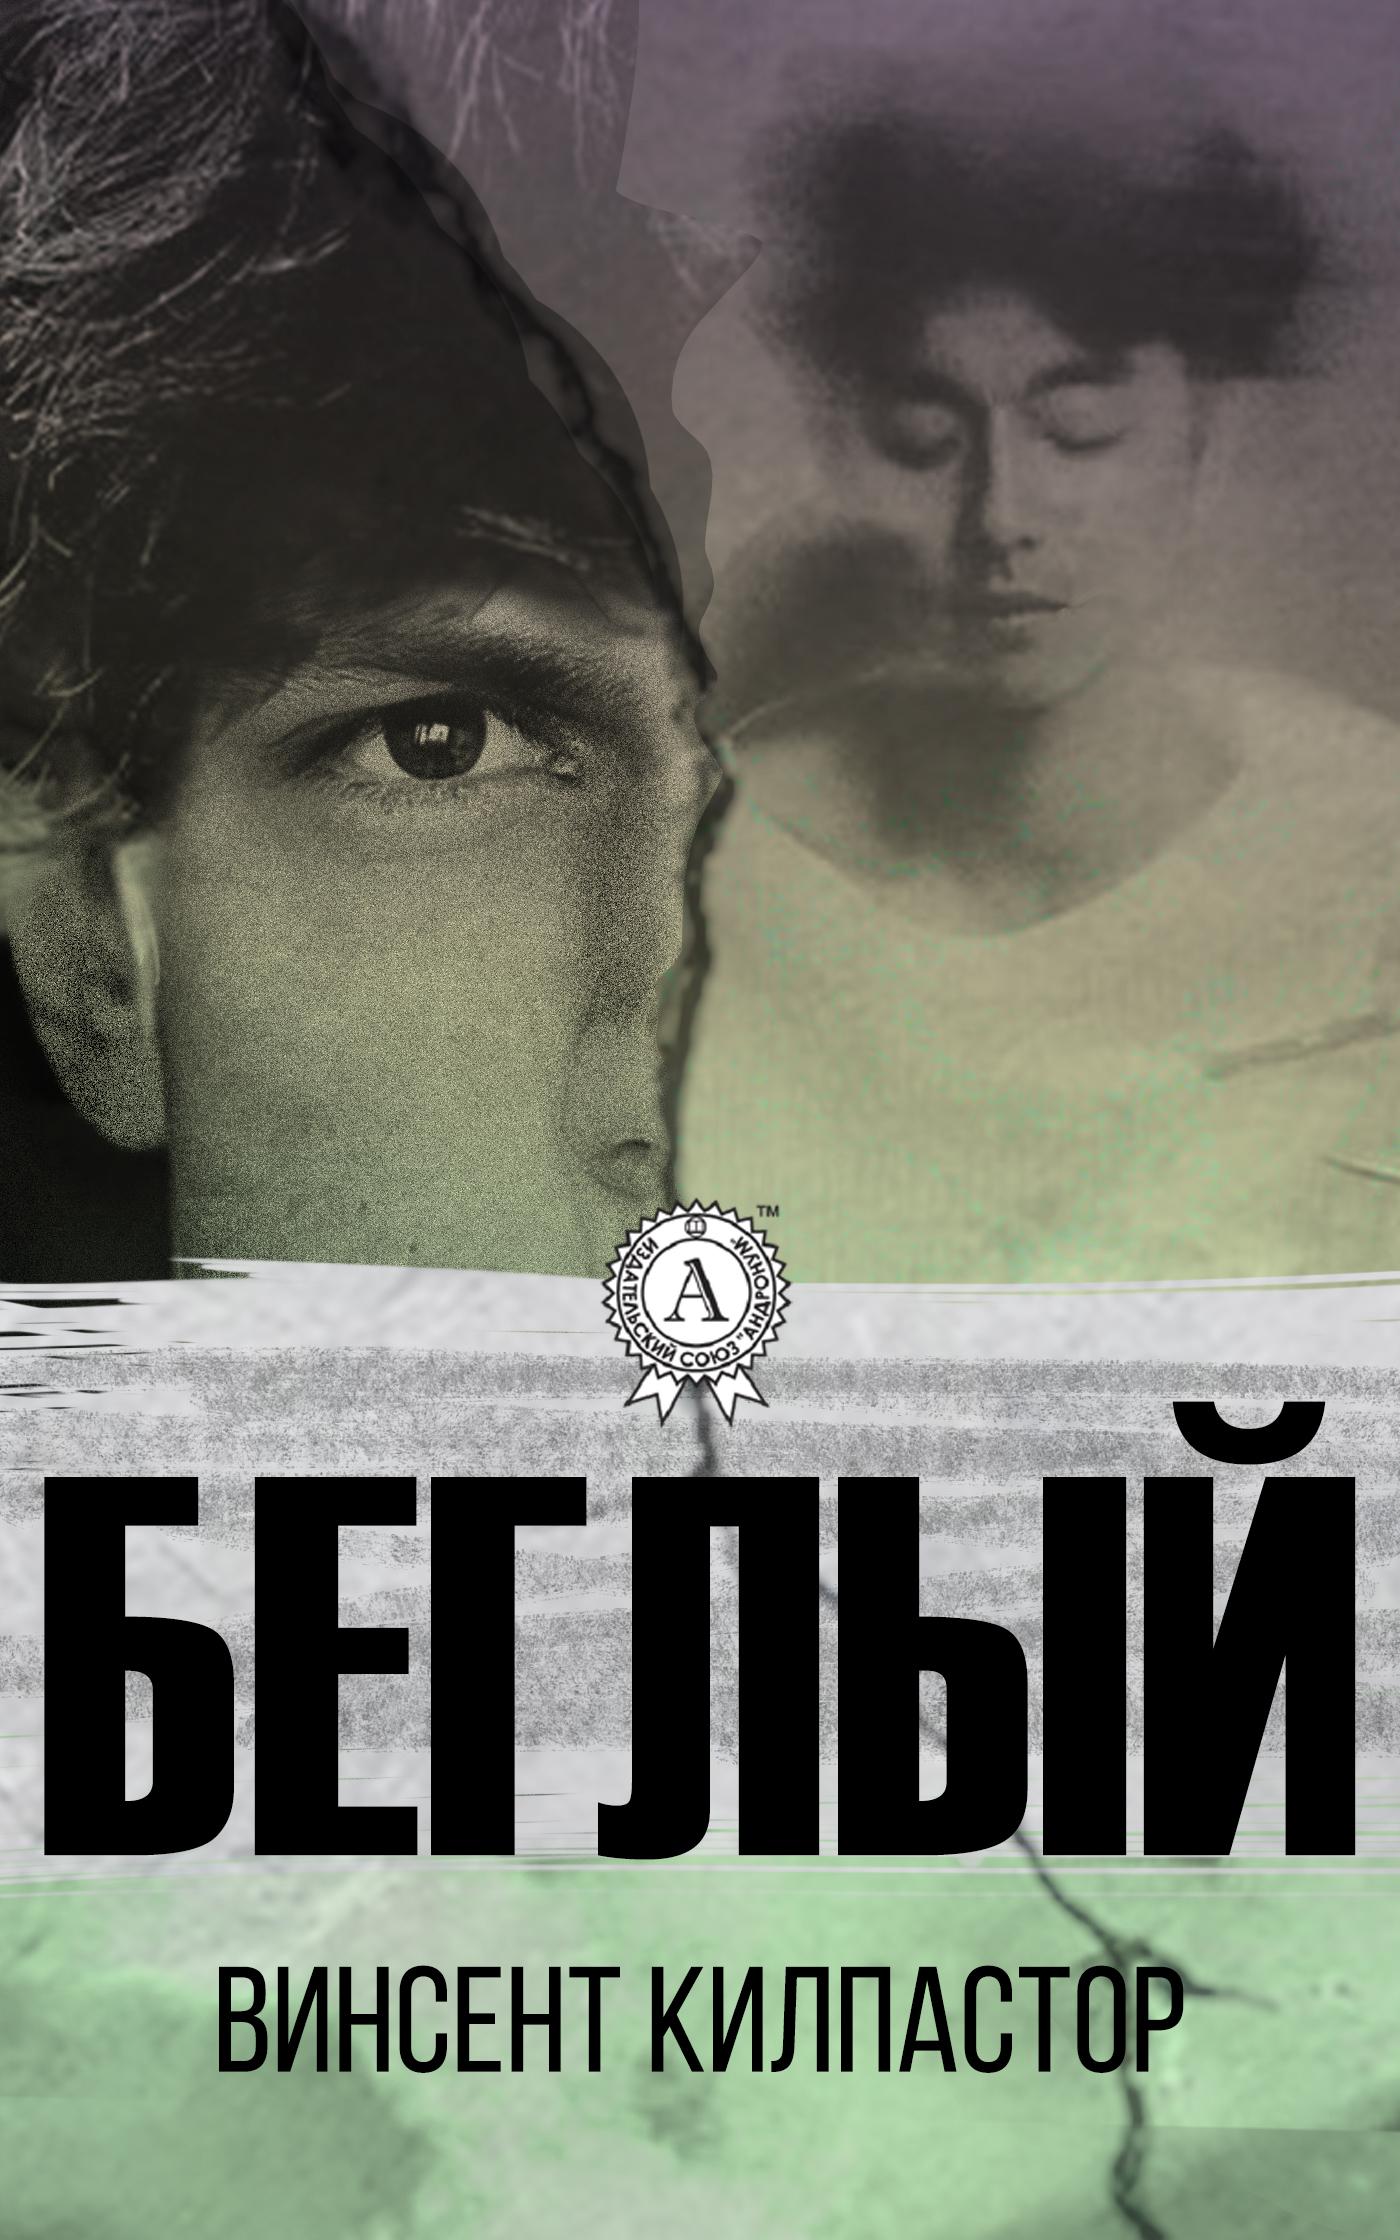 обложка книги static/bookimages/23/74/08/23740861.bin.dir/23740861.cover.jpg